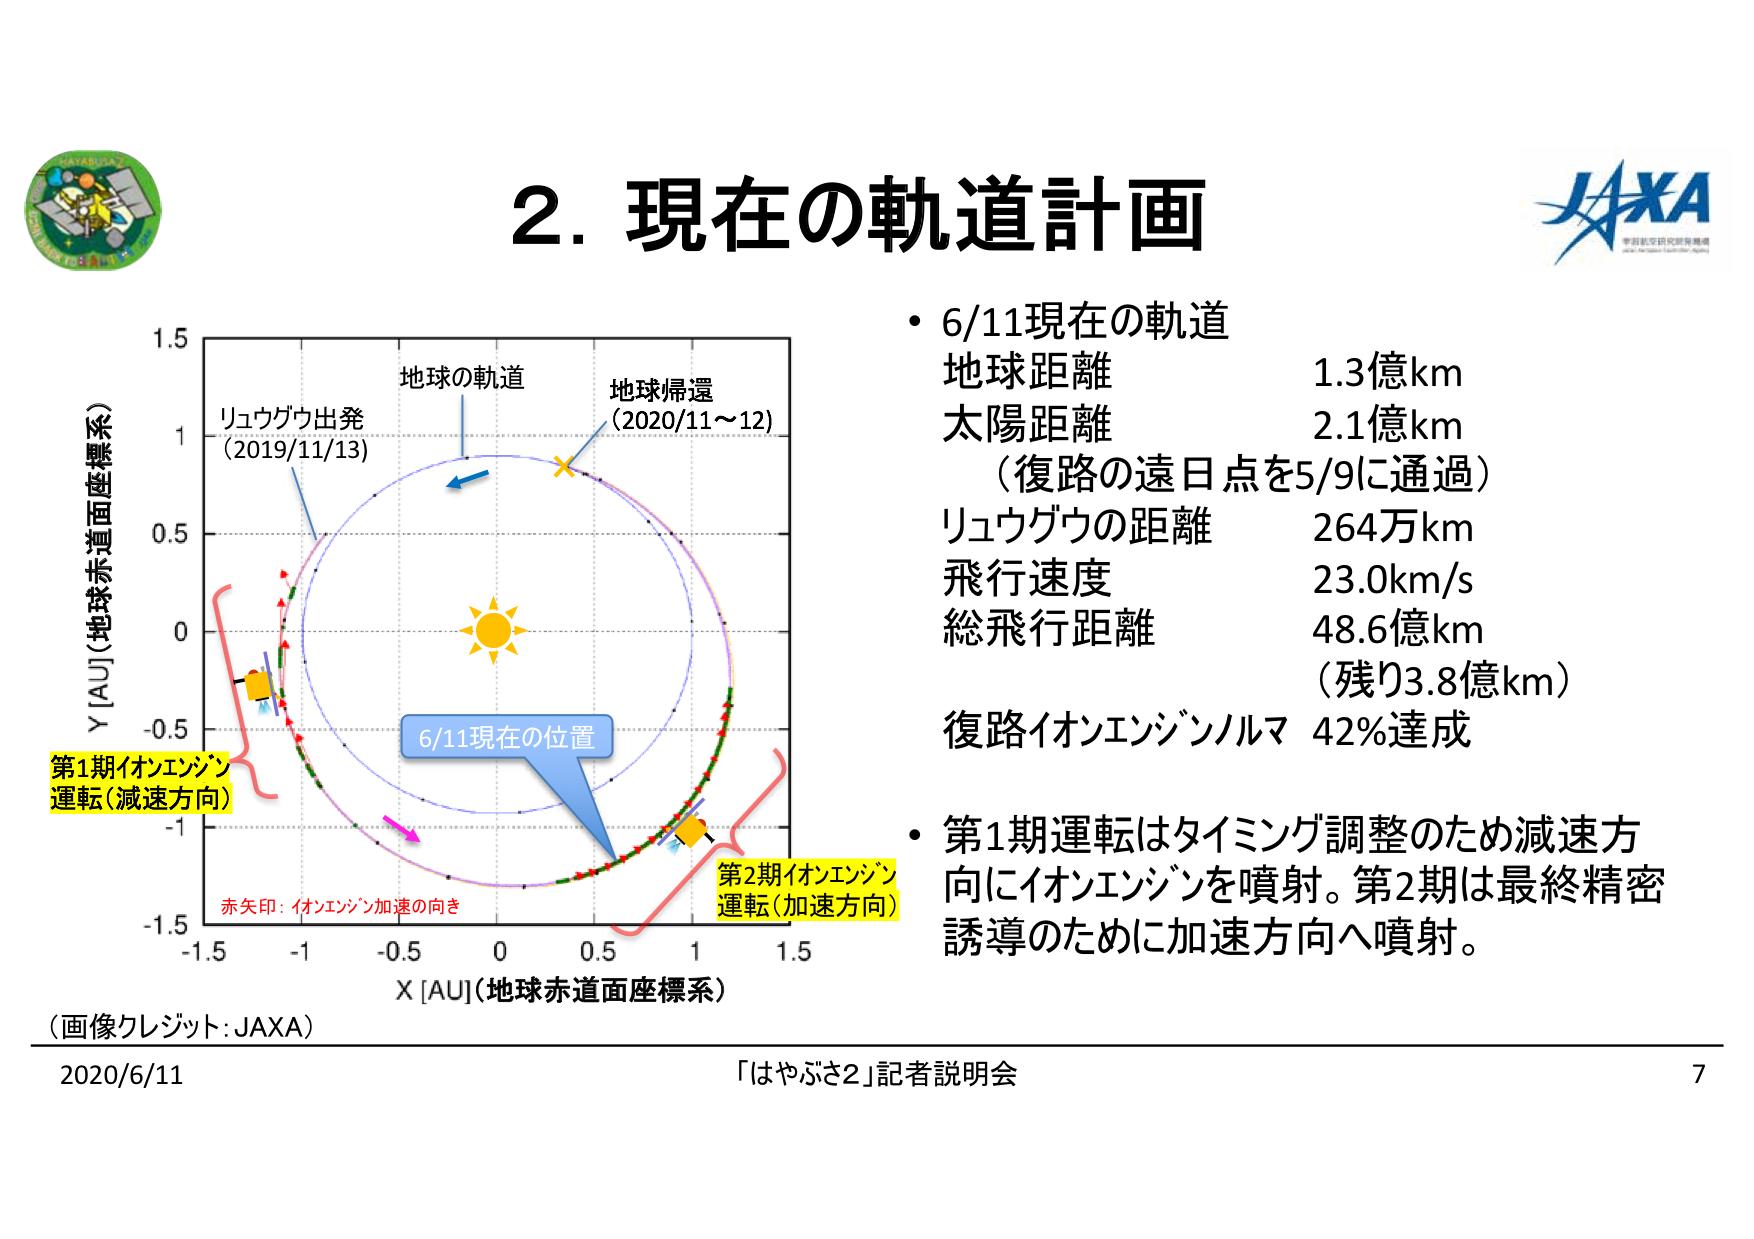 f:id:Imamura:20200611094518p:plain